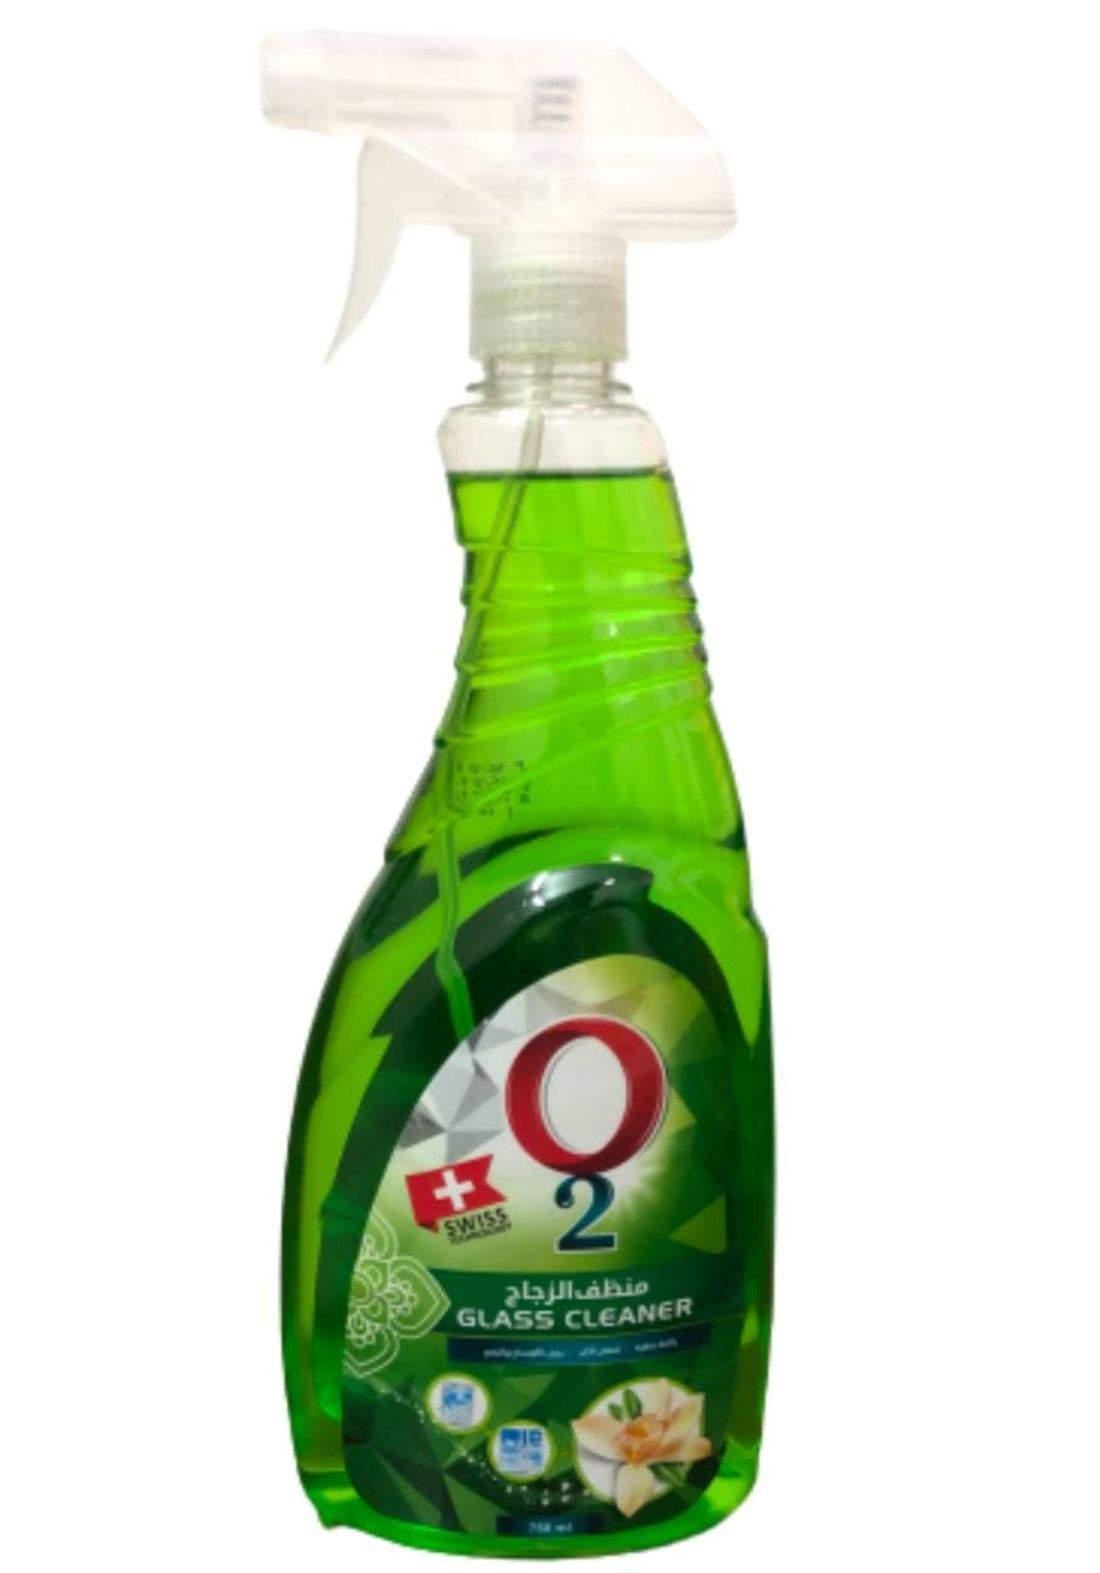 O2 Glass  Cleaner 750ml اوتو  منظف زجاج